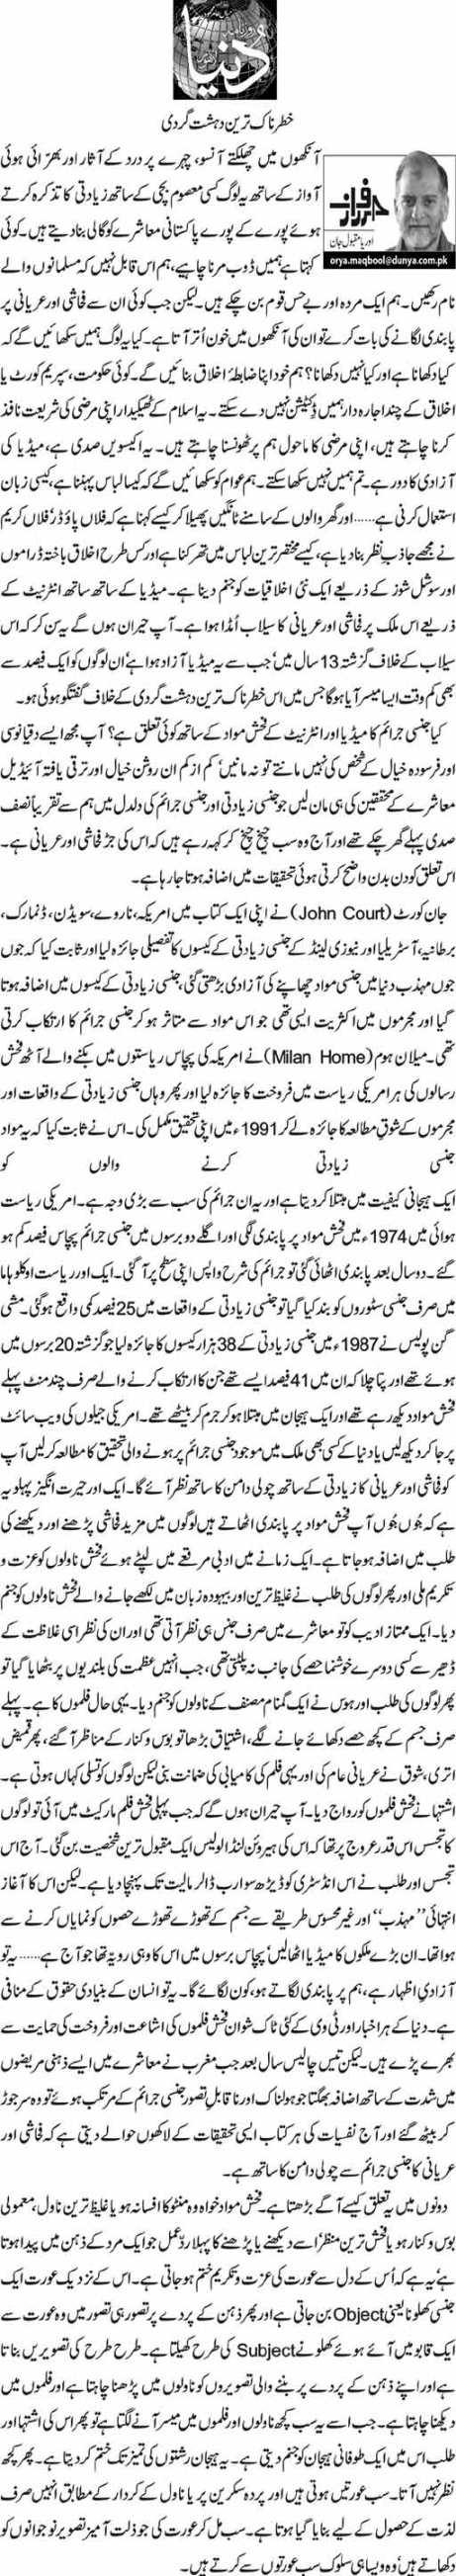 Khatar Naak Tareen Dehshat Gardi - Orya Maqbool Jan